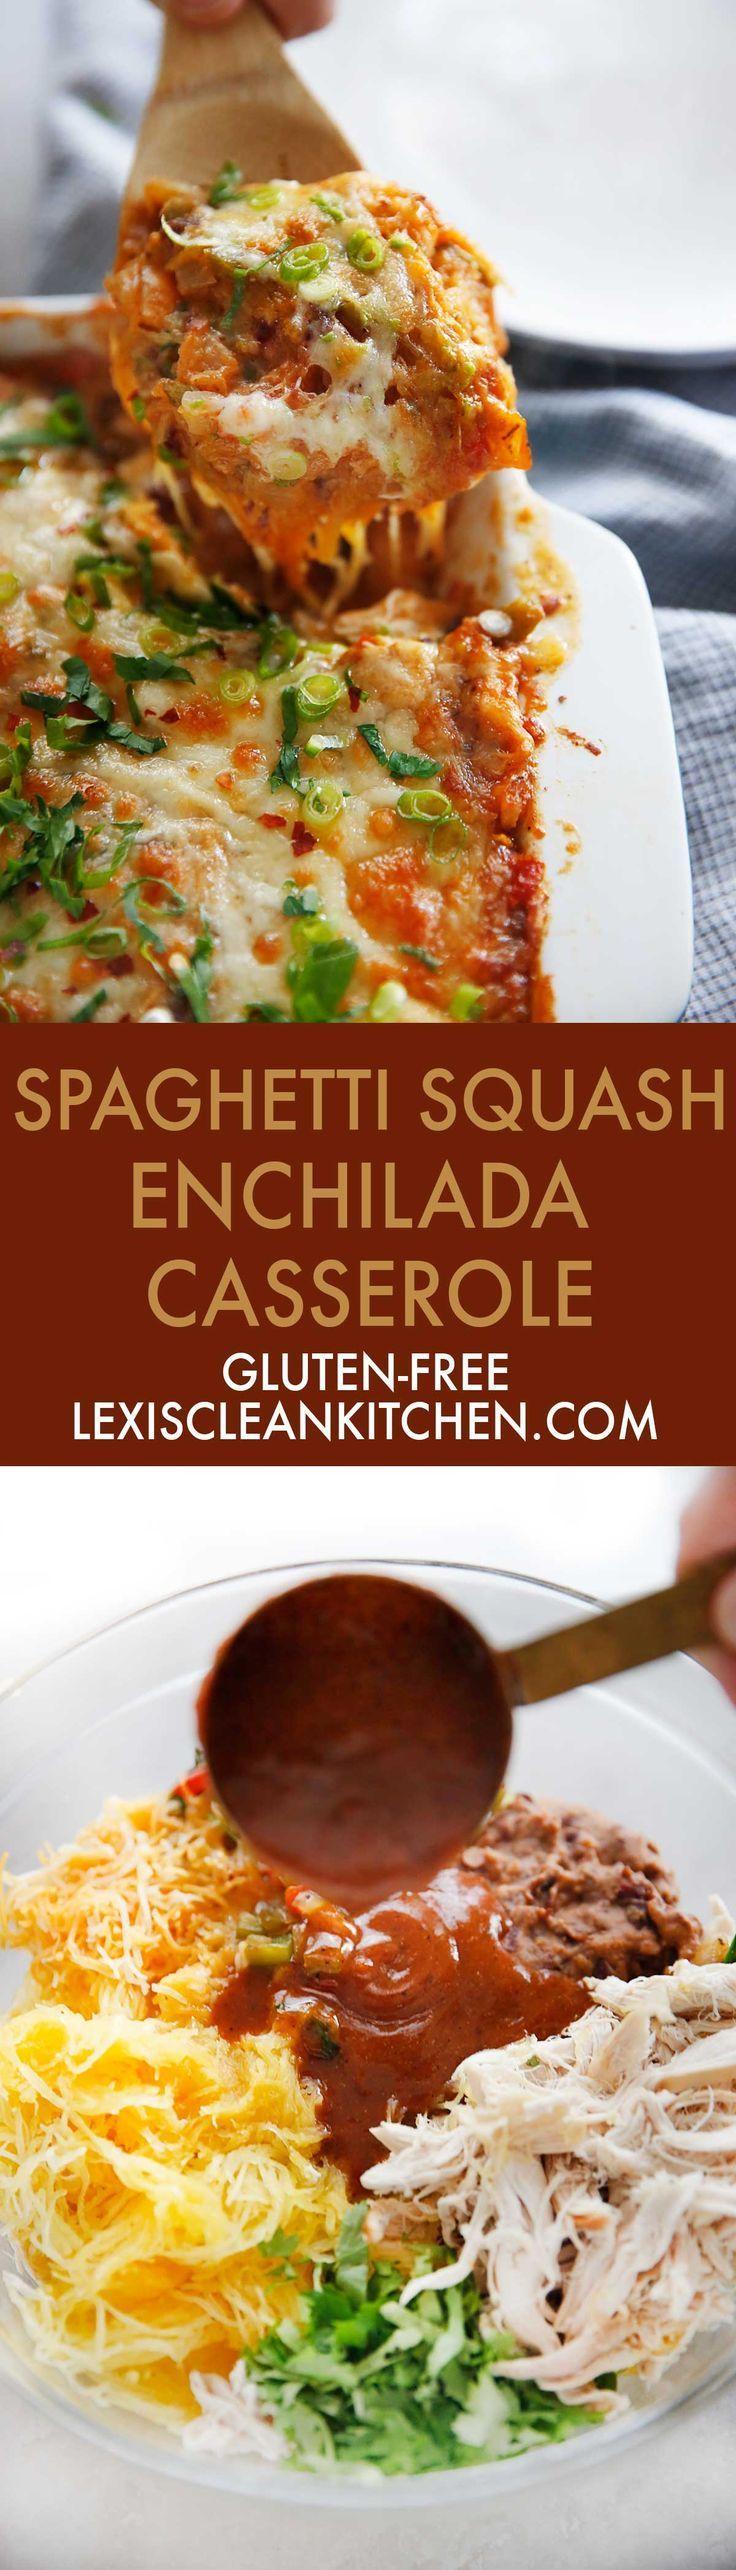 This Spaghetti Squash Enchilada Casserole with chicken is healthy, gluten-free, and paleo-friendly casserole! #spaghettisquash #casserole #easydinner #enchiladas #paleo